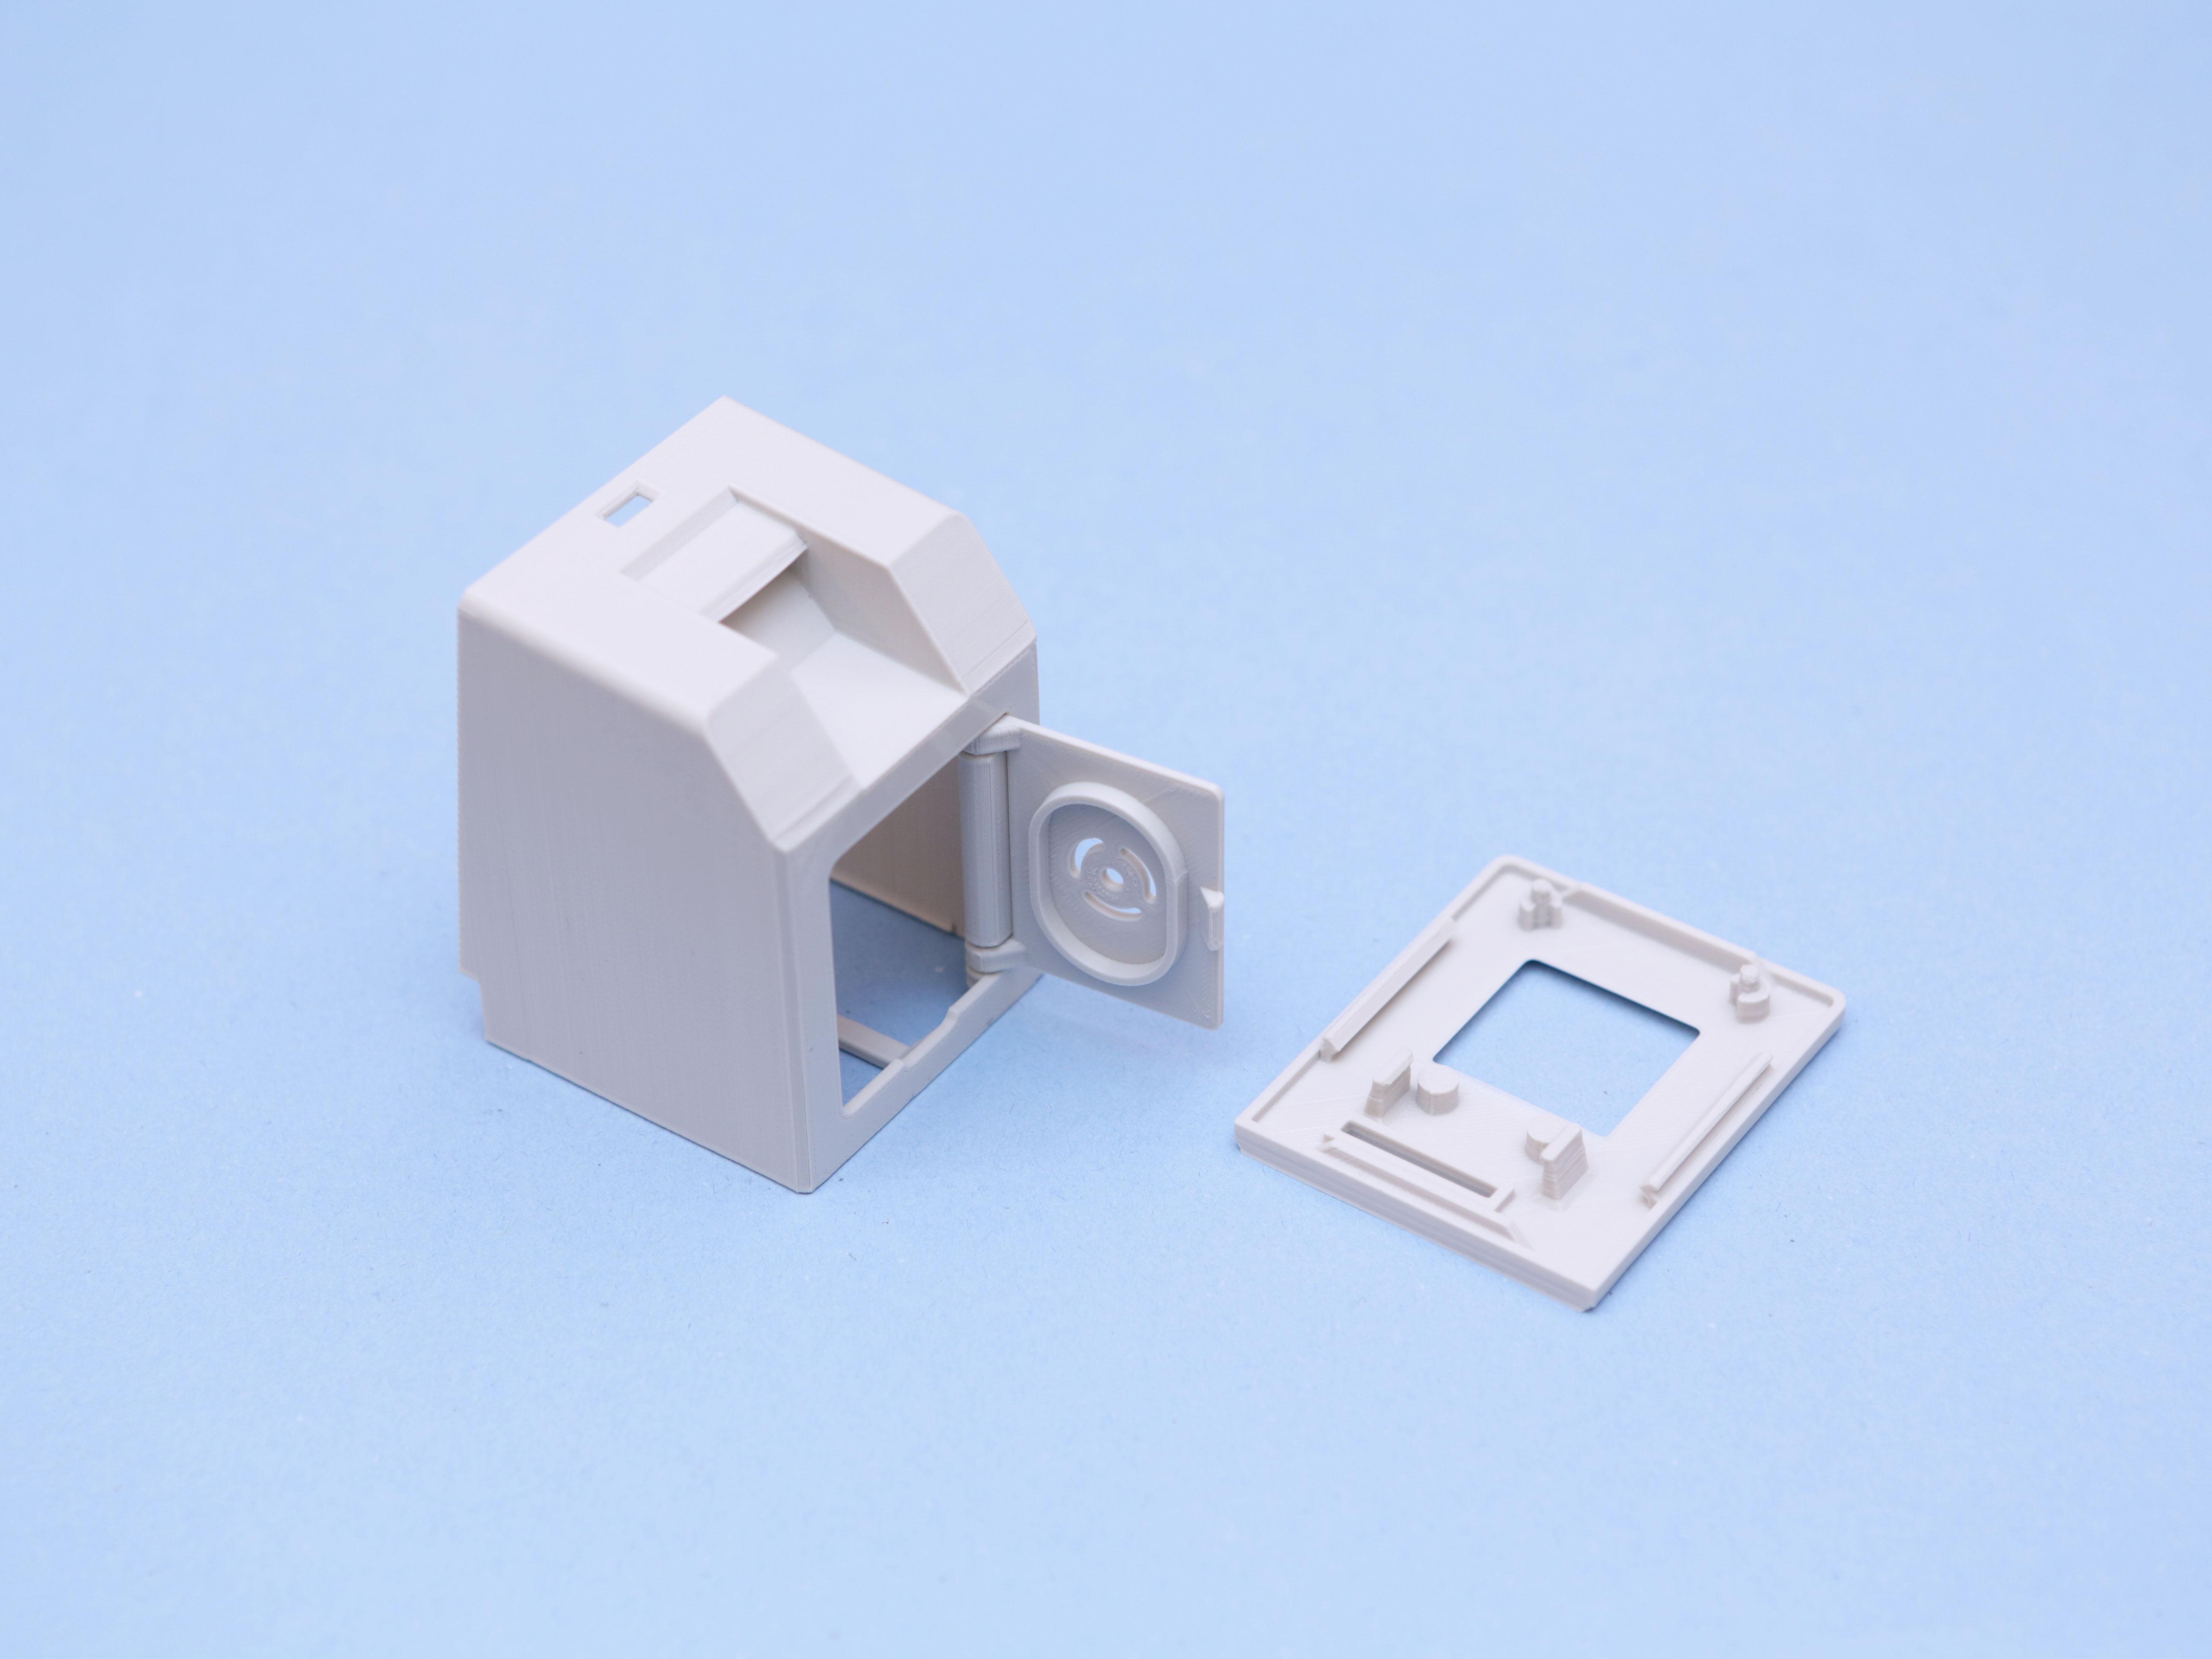 3d_printing_hero-3d-parts.jpg